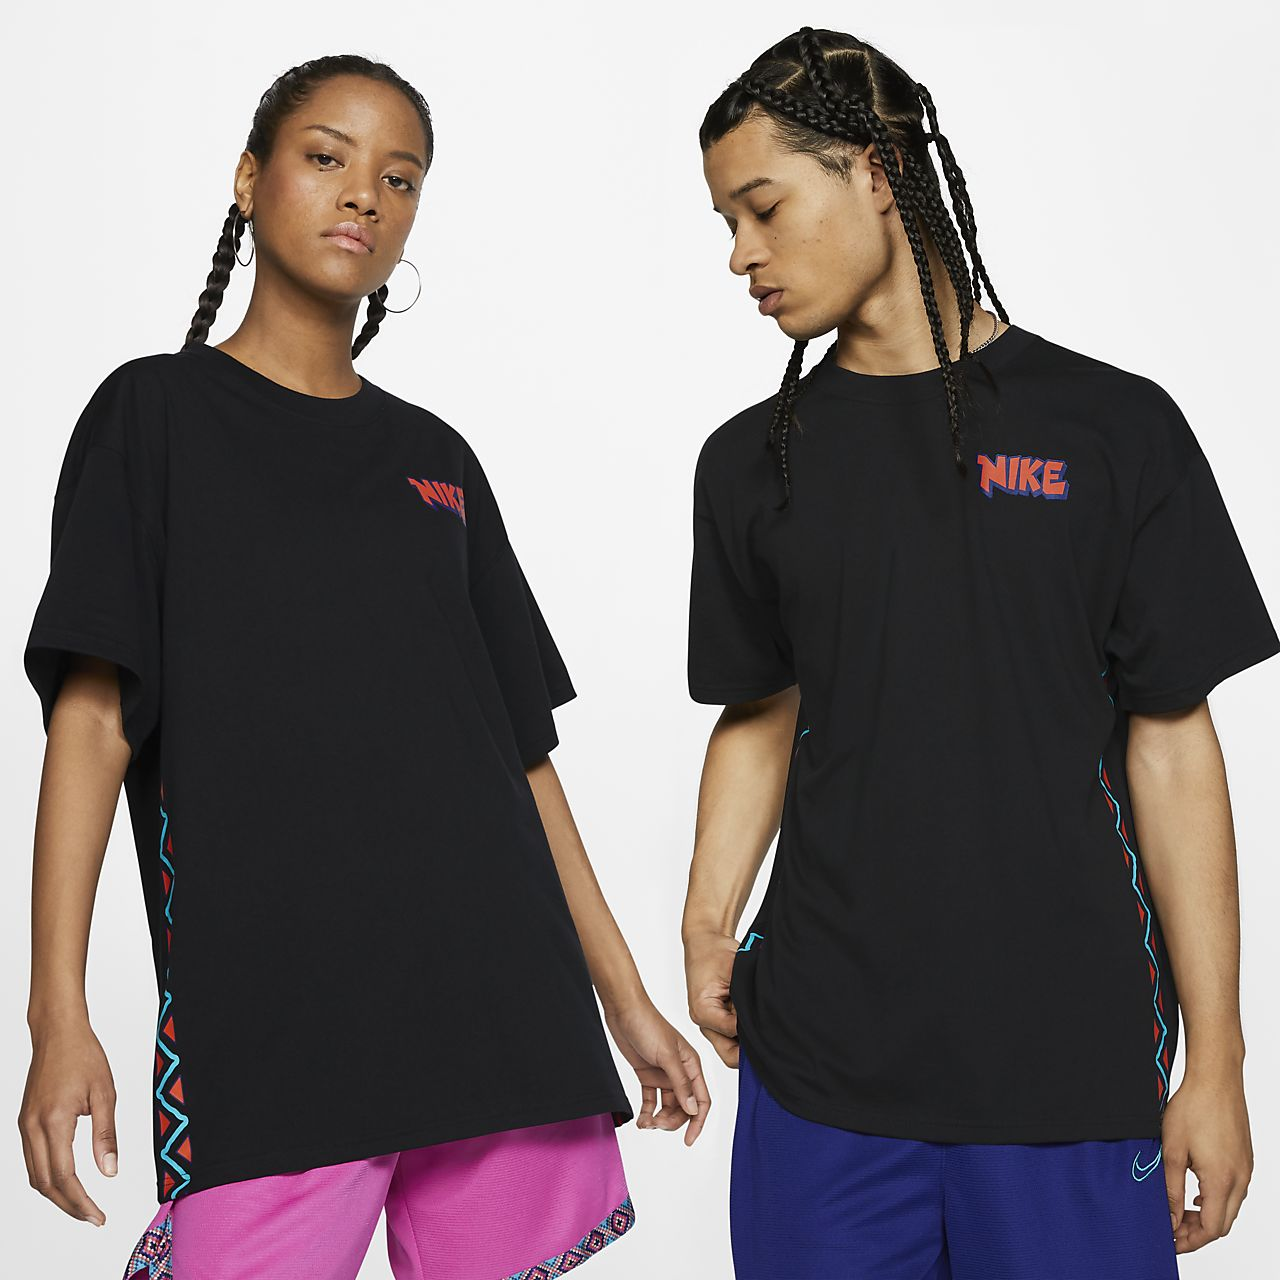 Nike Exploration Series Camiseta de baloncesto